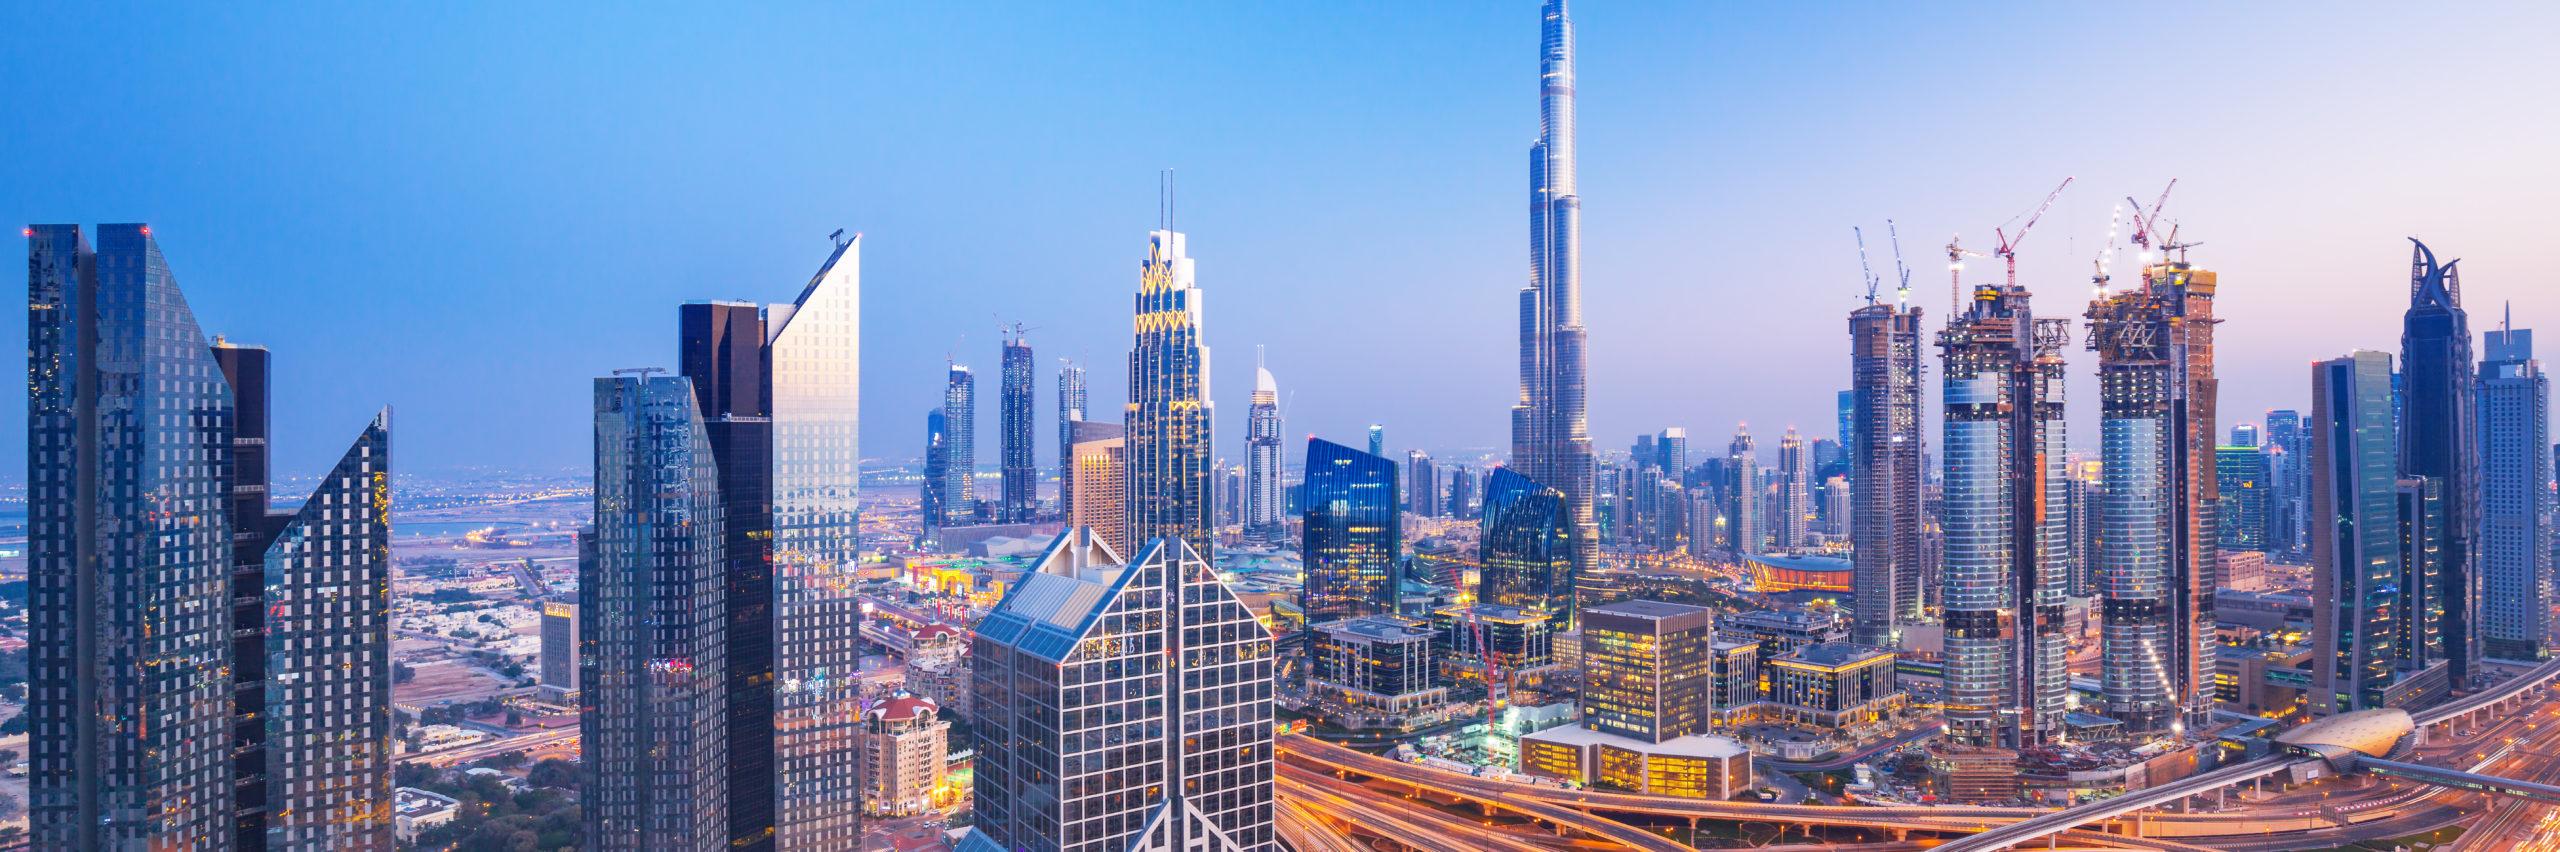 Dubai skyline at sunset with beautiful city center lights and Sheikh Zayed road traffic, Dubai, United Arab Emirates - Image